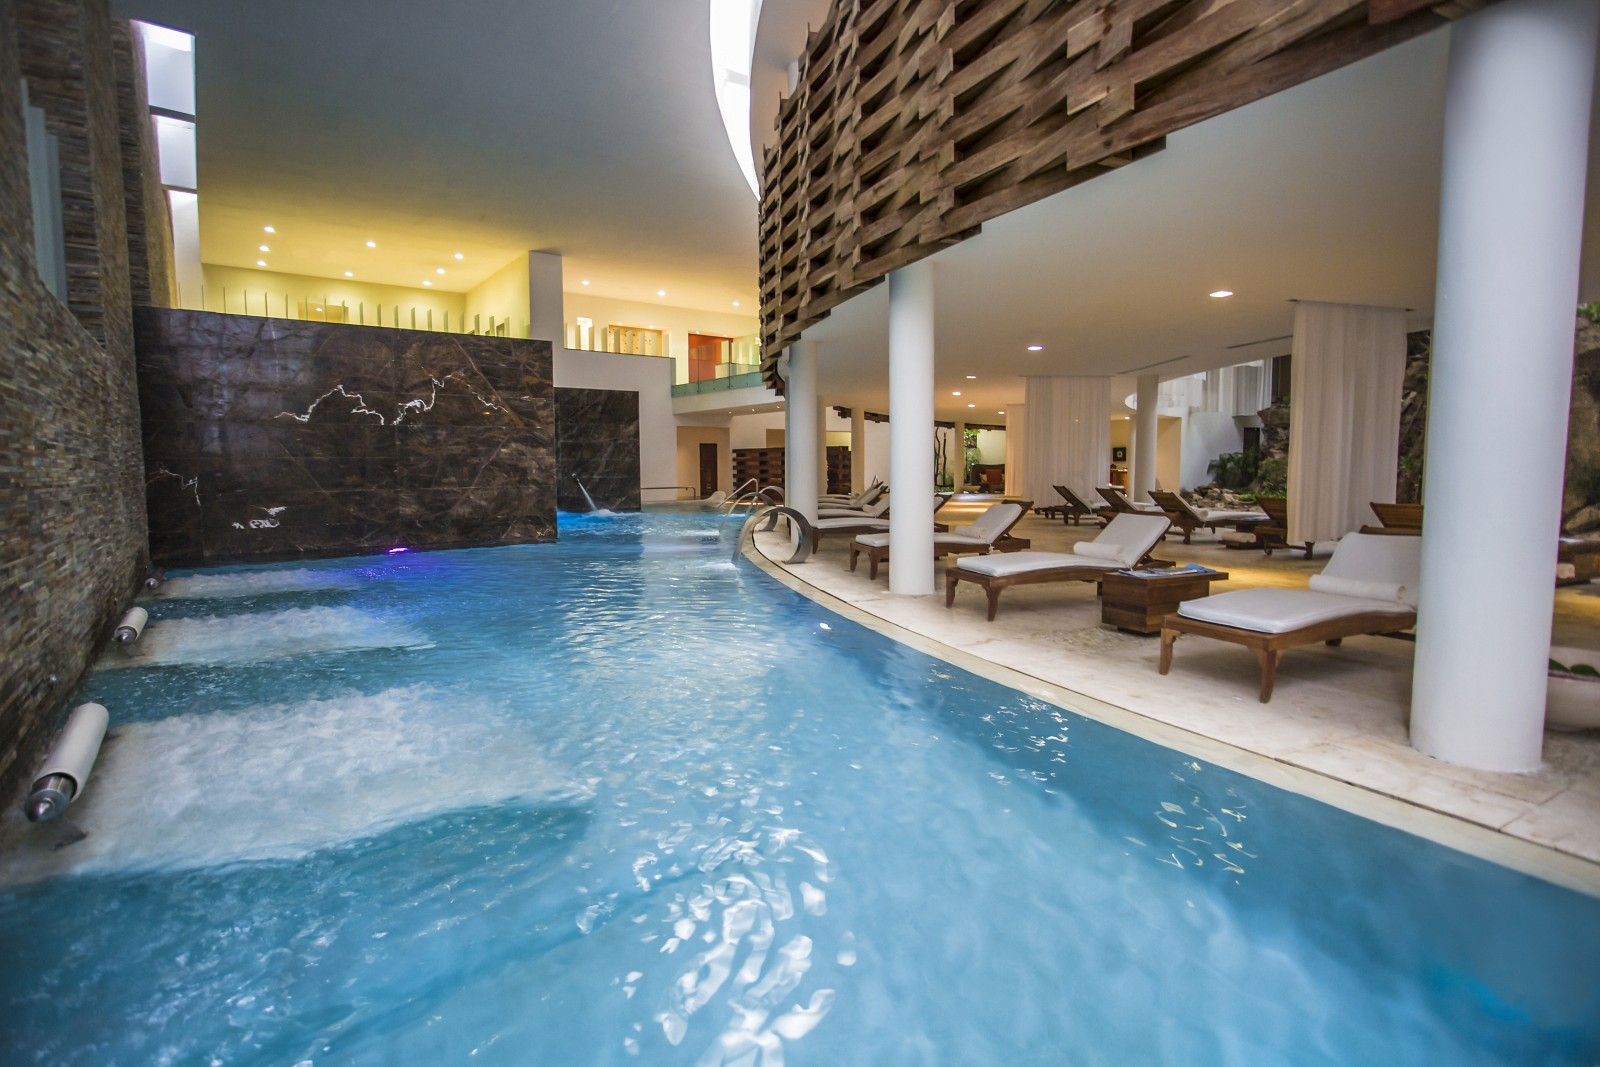 Travel Agency All-Inclusive Resort Grand Velas Riviera Maya 098